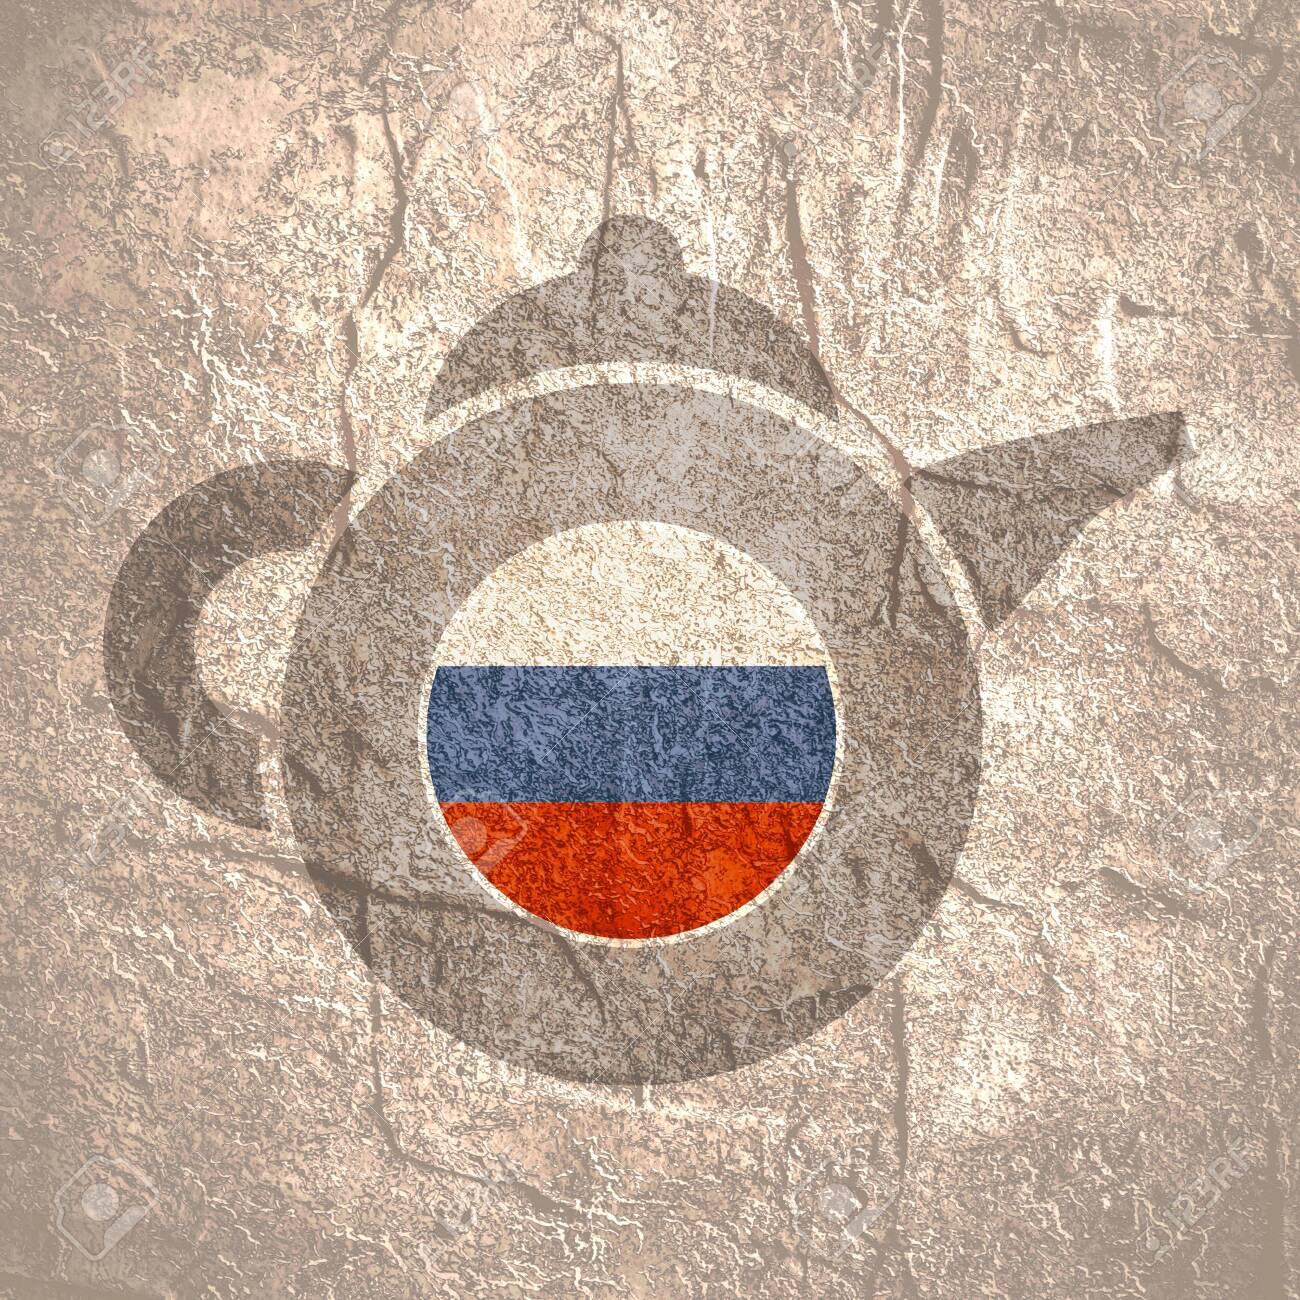 Tea emblem template and design element for tea shop, restauran. Teapot abstract illustration. Flag of the Russia - 151184499